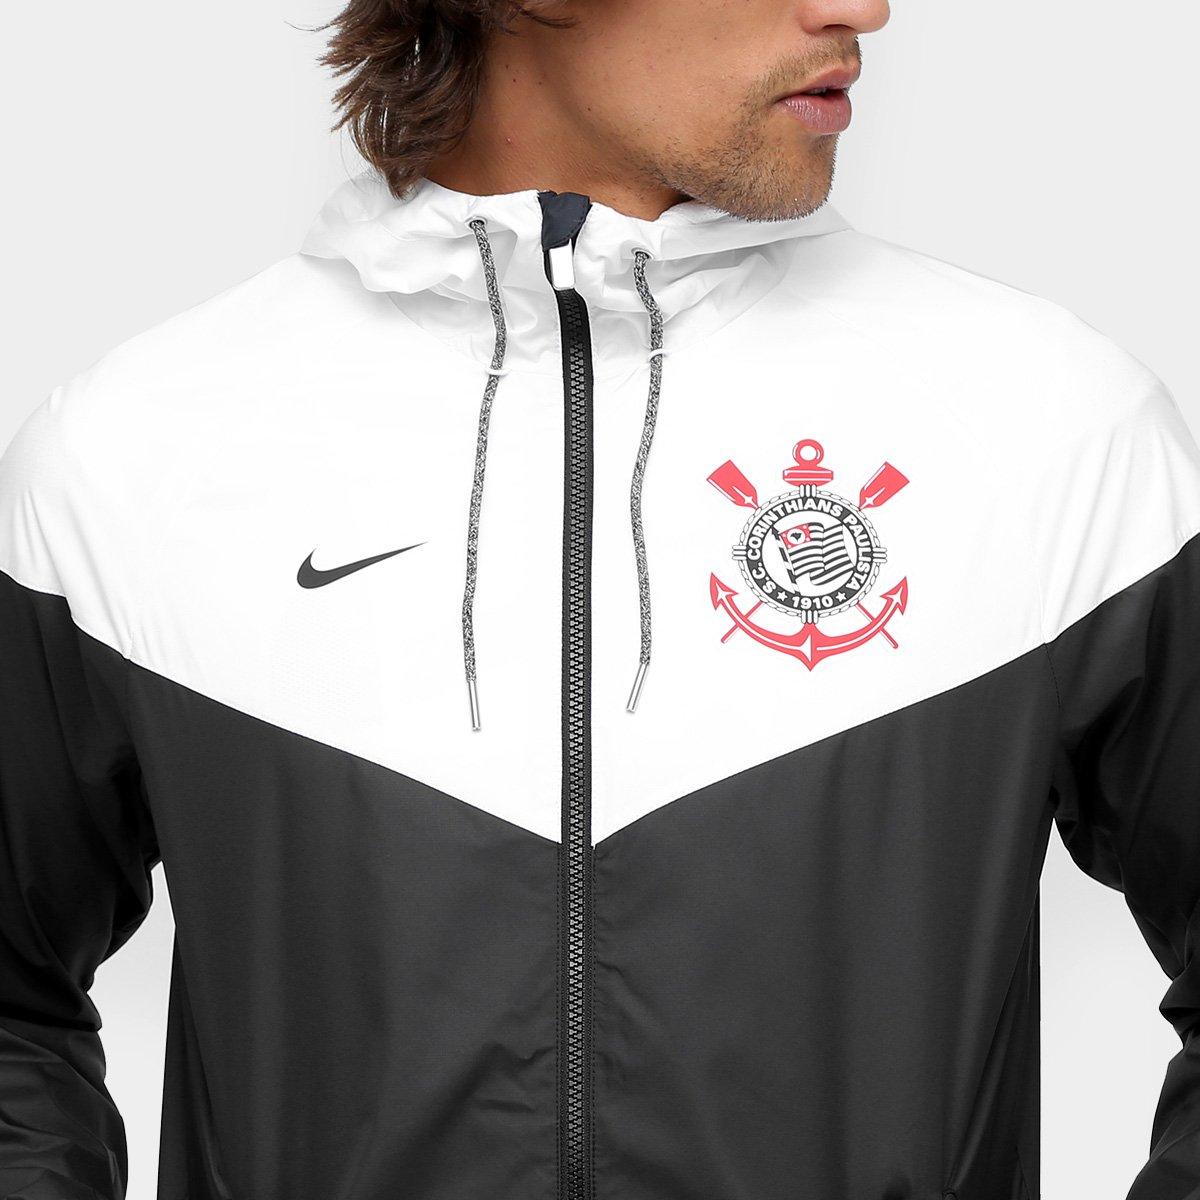 4012b1bdc1 ... f07625f76e0 Jaqueta Corinthians Nike WVN Masculina - Compre Agora  Netshoes ...